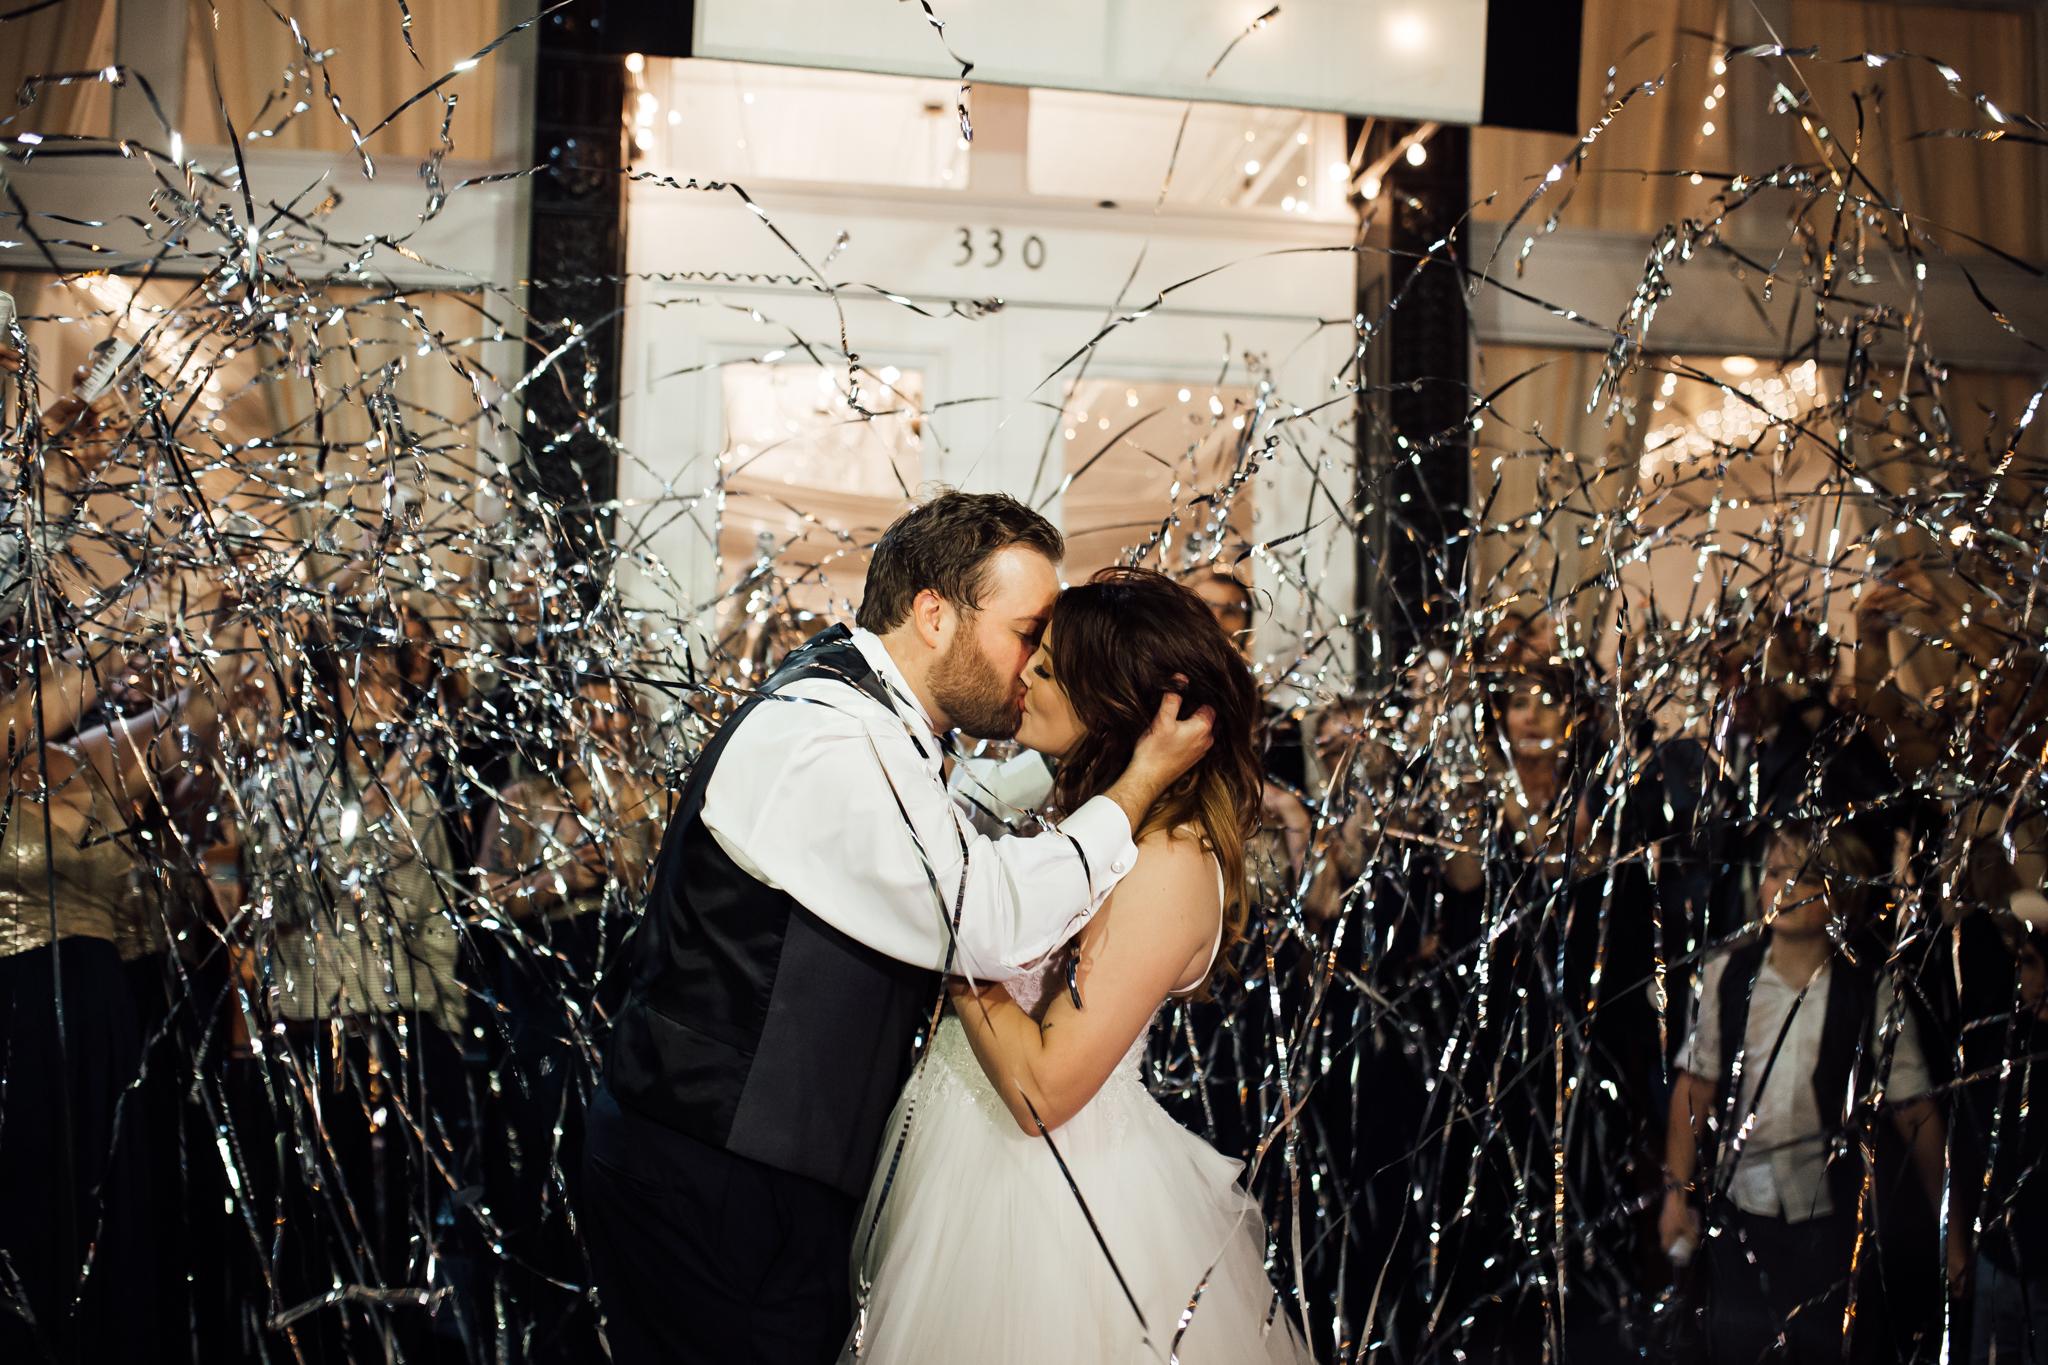 memphis-wedding-photographers-thewarmtharoundyou-ballinese-ballroom (57 of 65).jpg